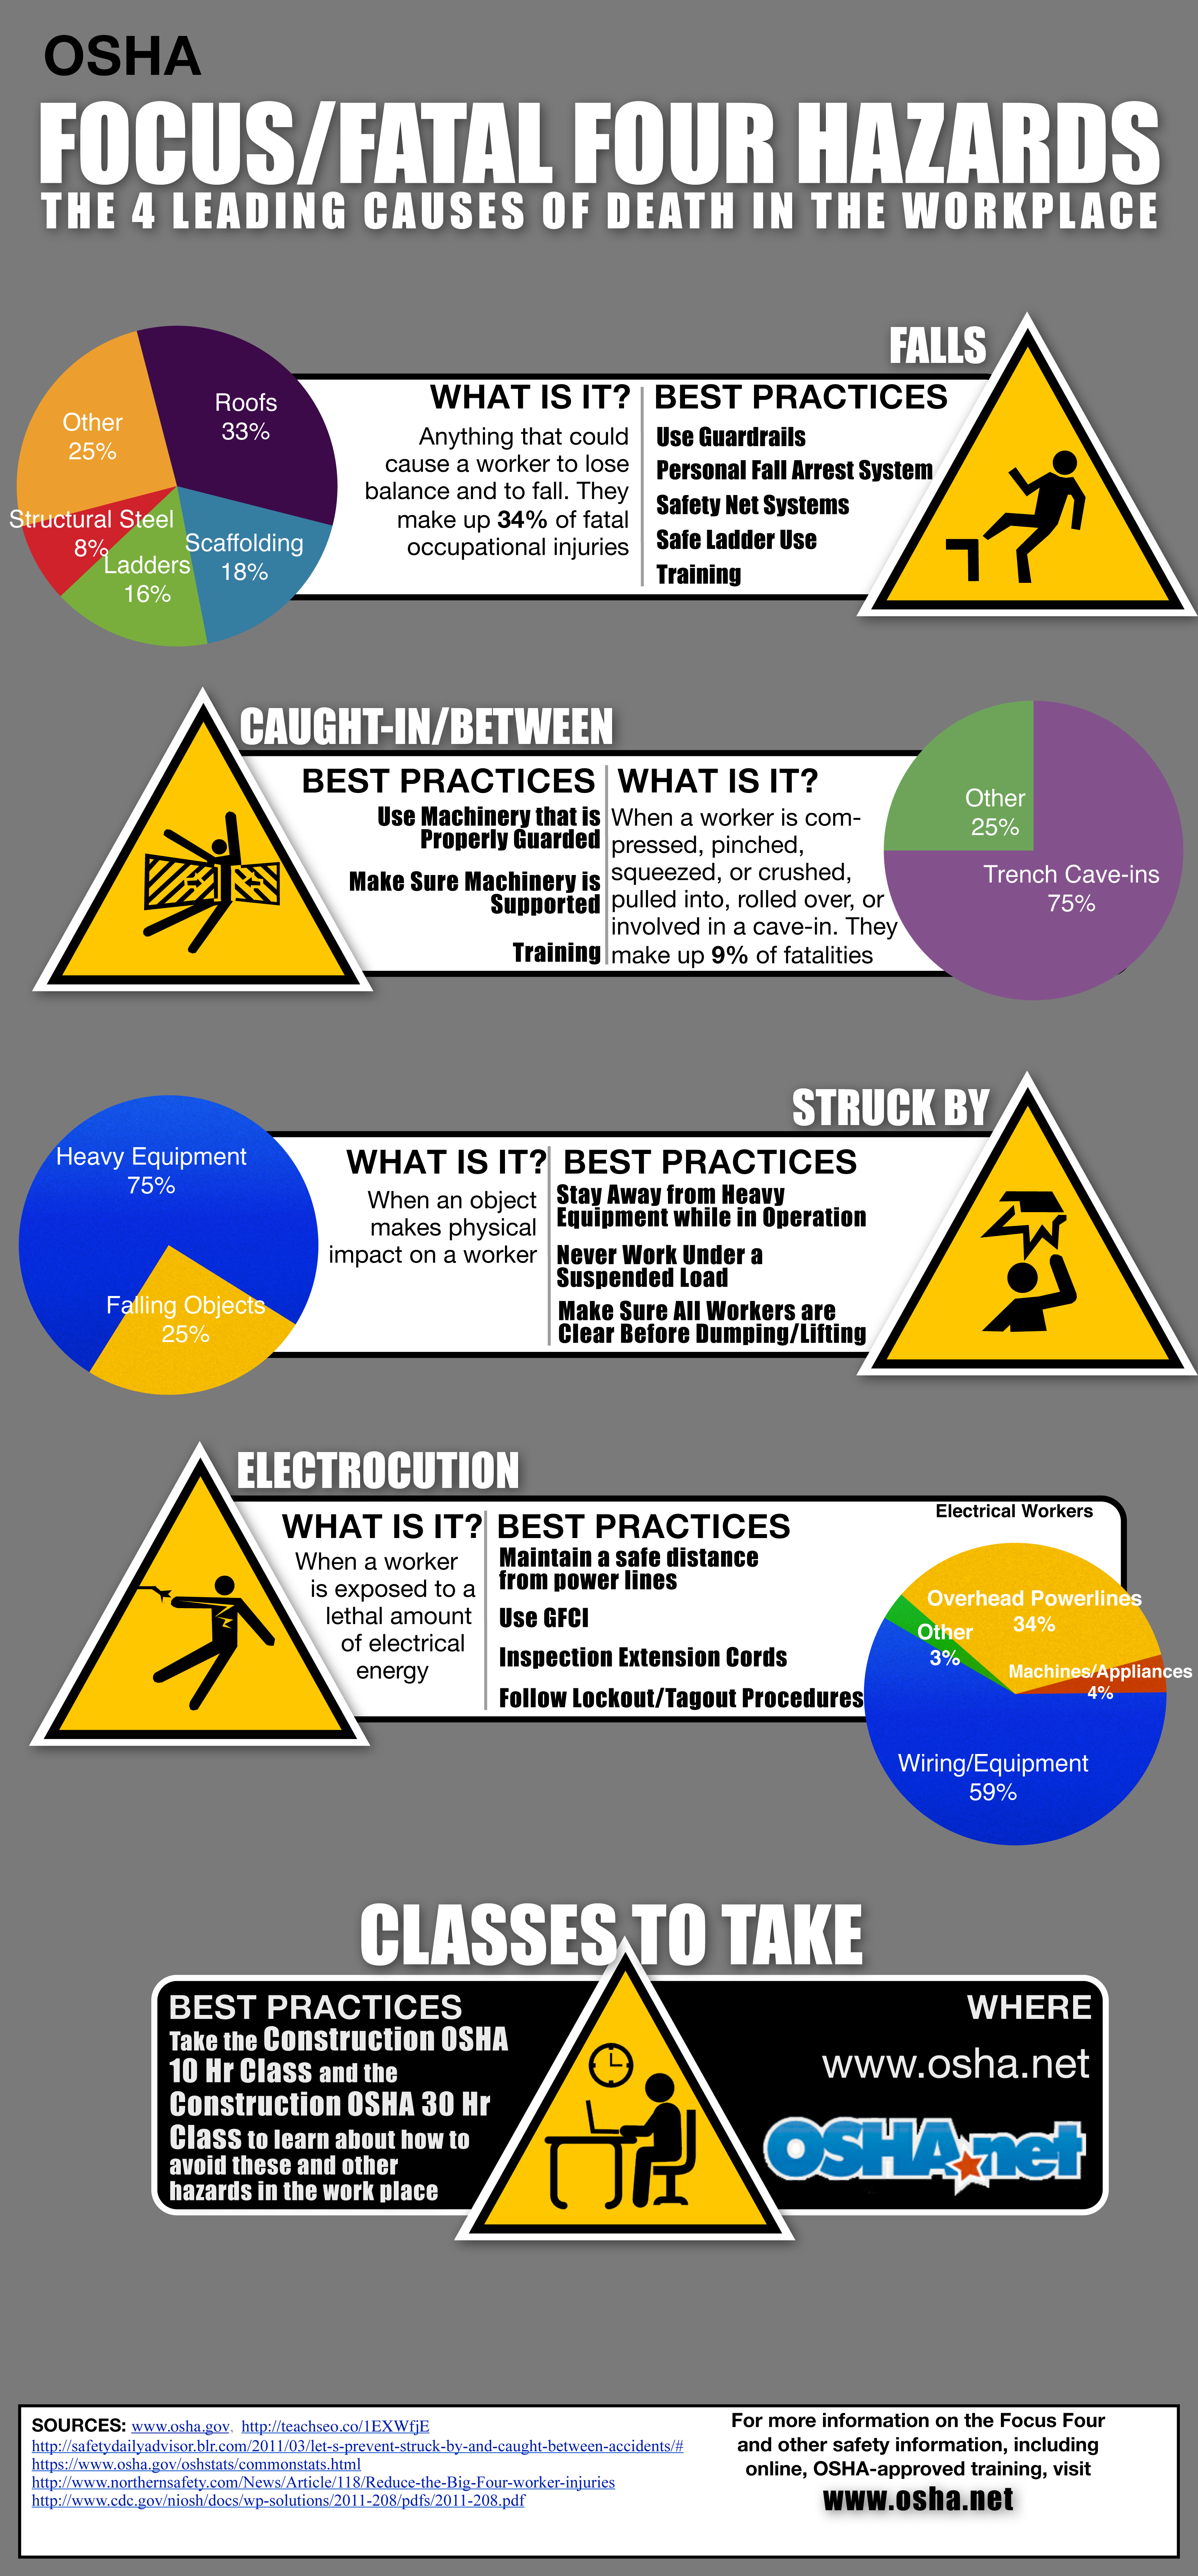 OSHA Focus Four Hazards Infographic